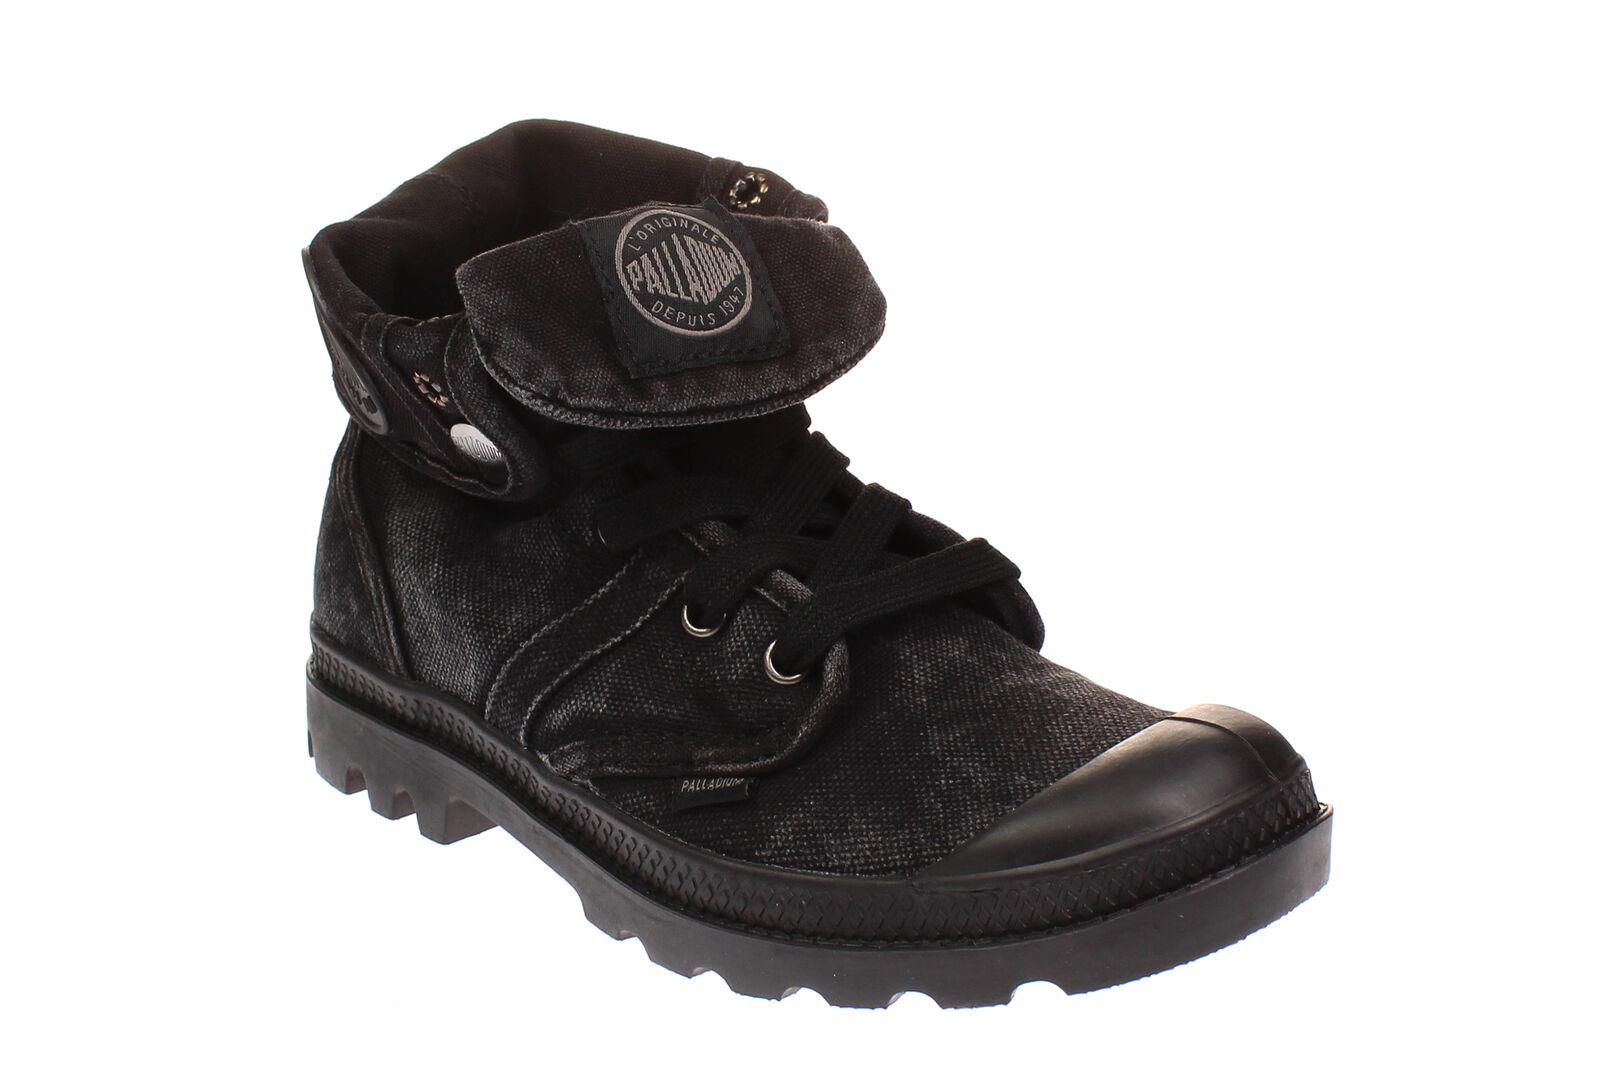 Palladium 71874 baggy W-señora zapatos botas botas - 862-Black-metal